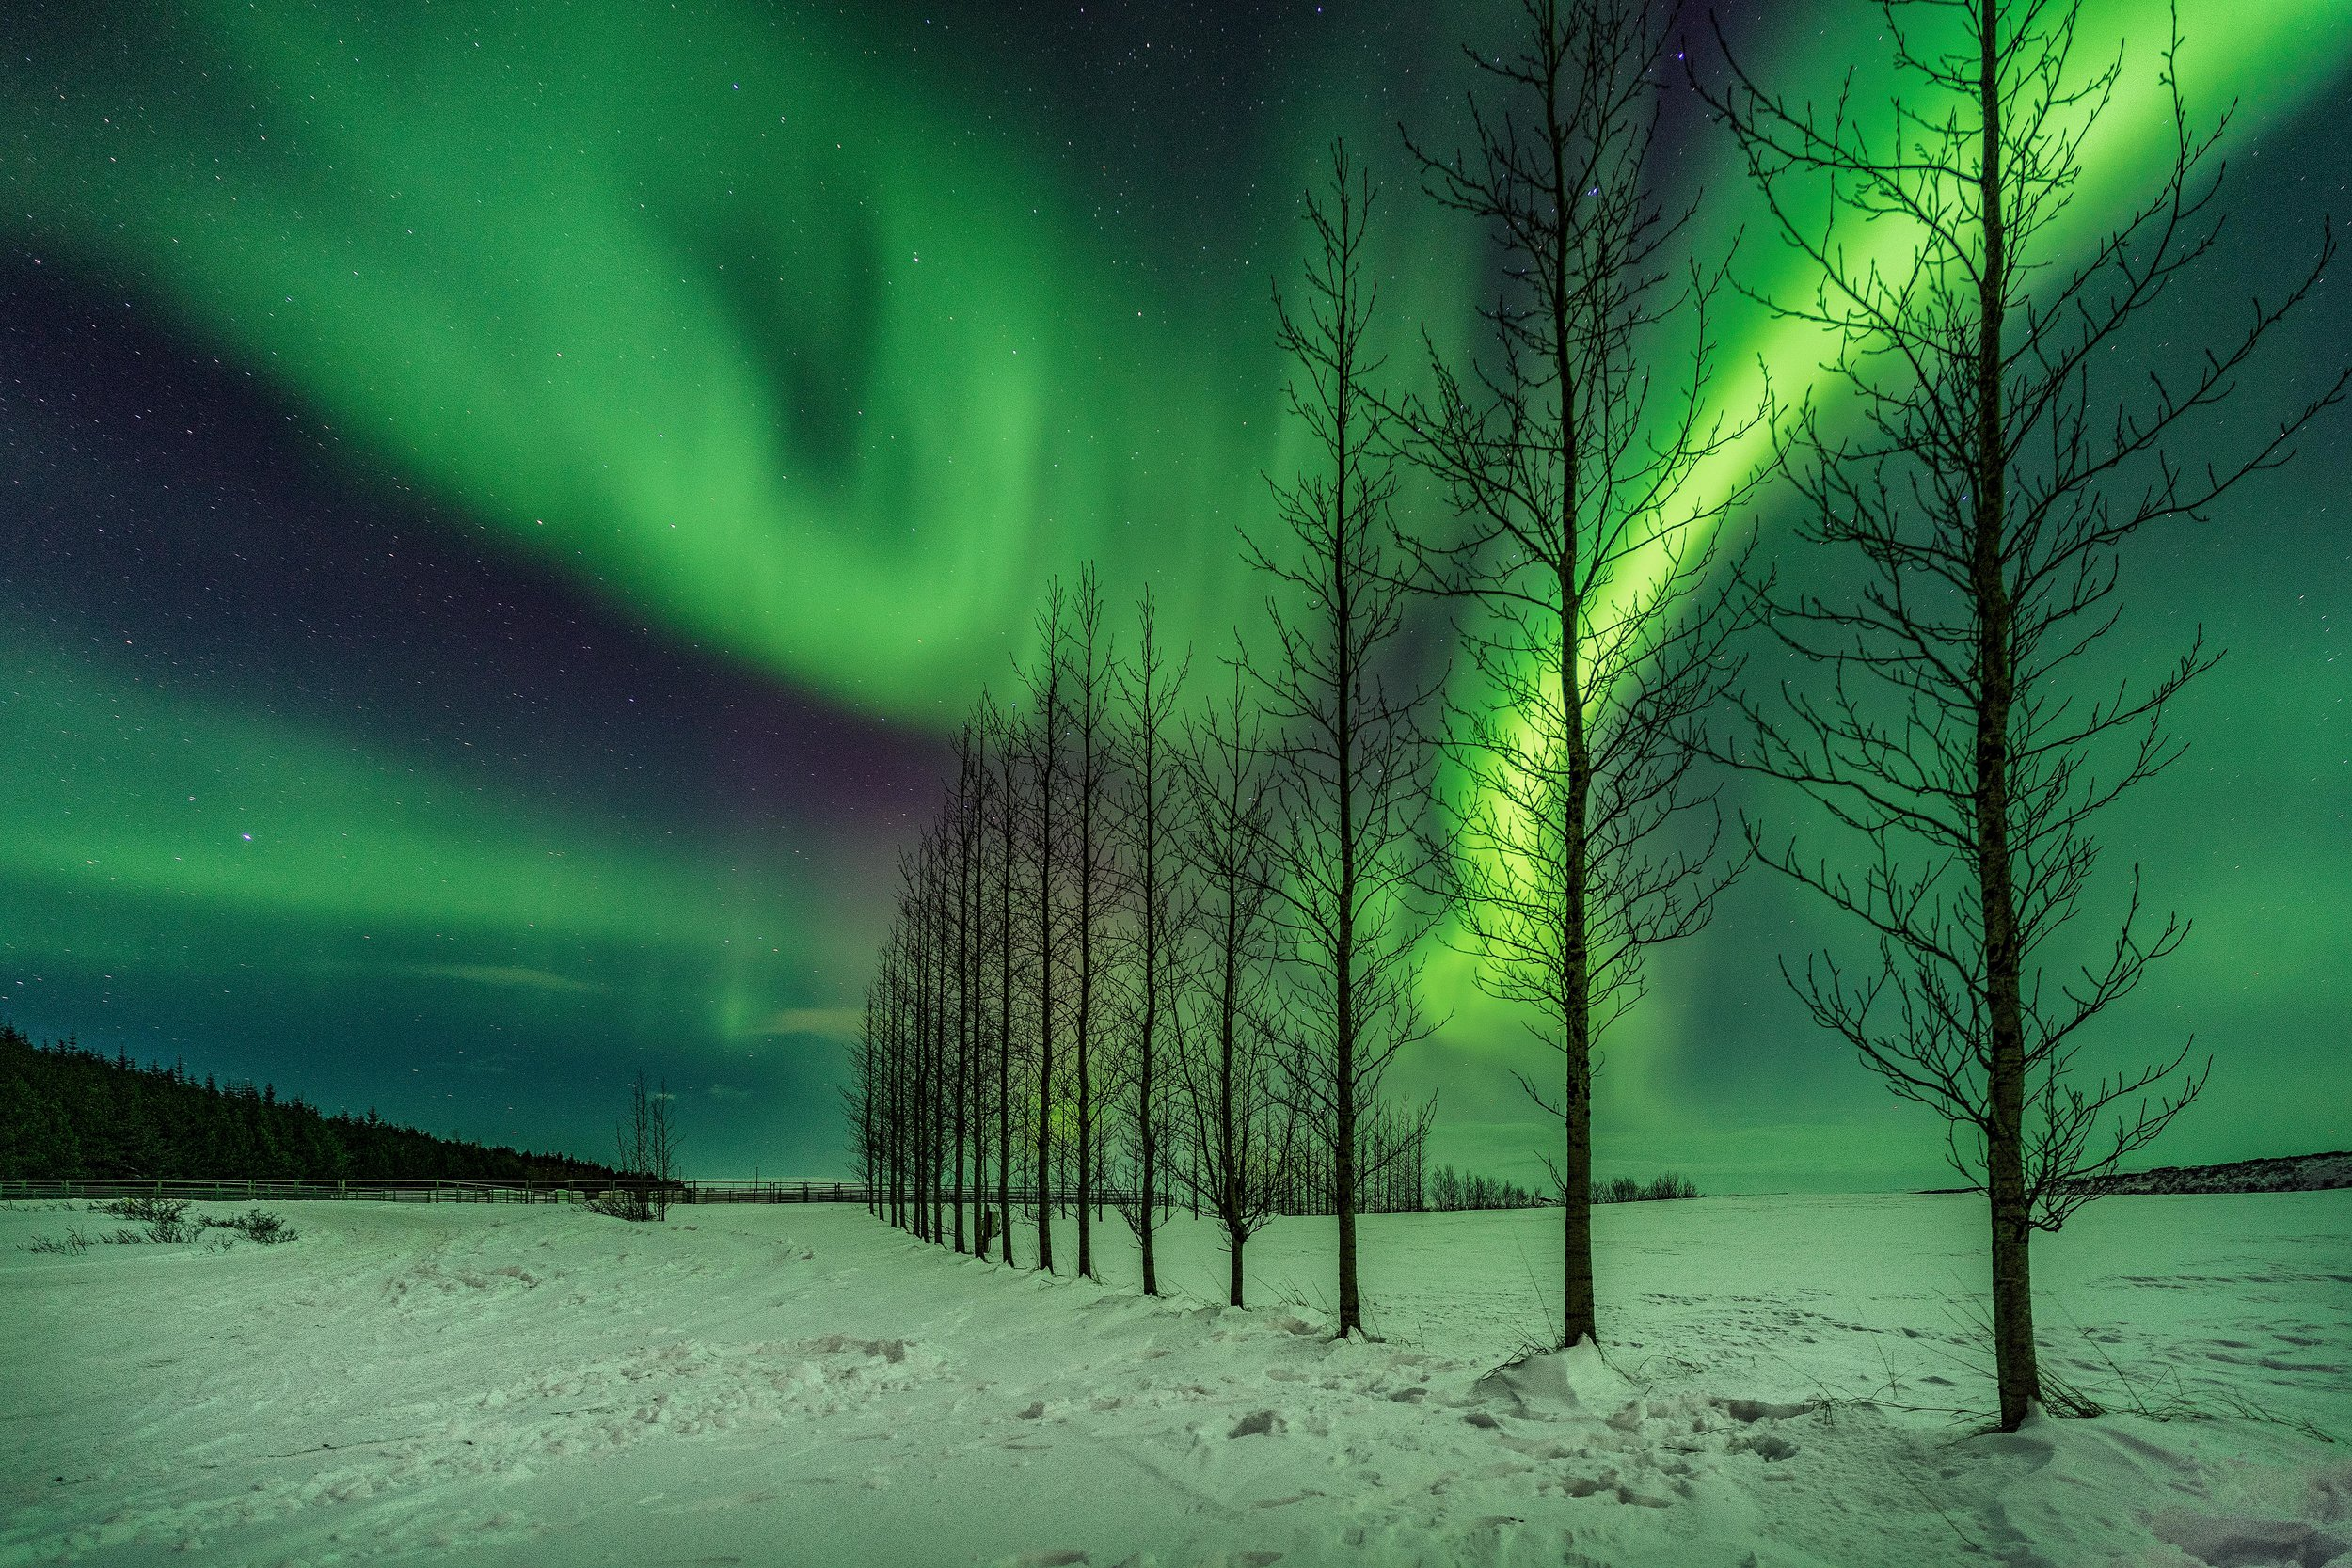 Iceland. snow. travel. adventure. photography. trip. epic landscape. snow. cold. freezing. sunrise. nothern lights. trees under lights.jpg